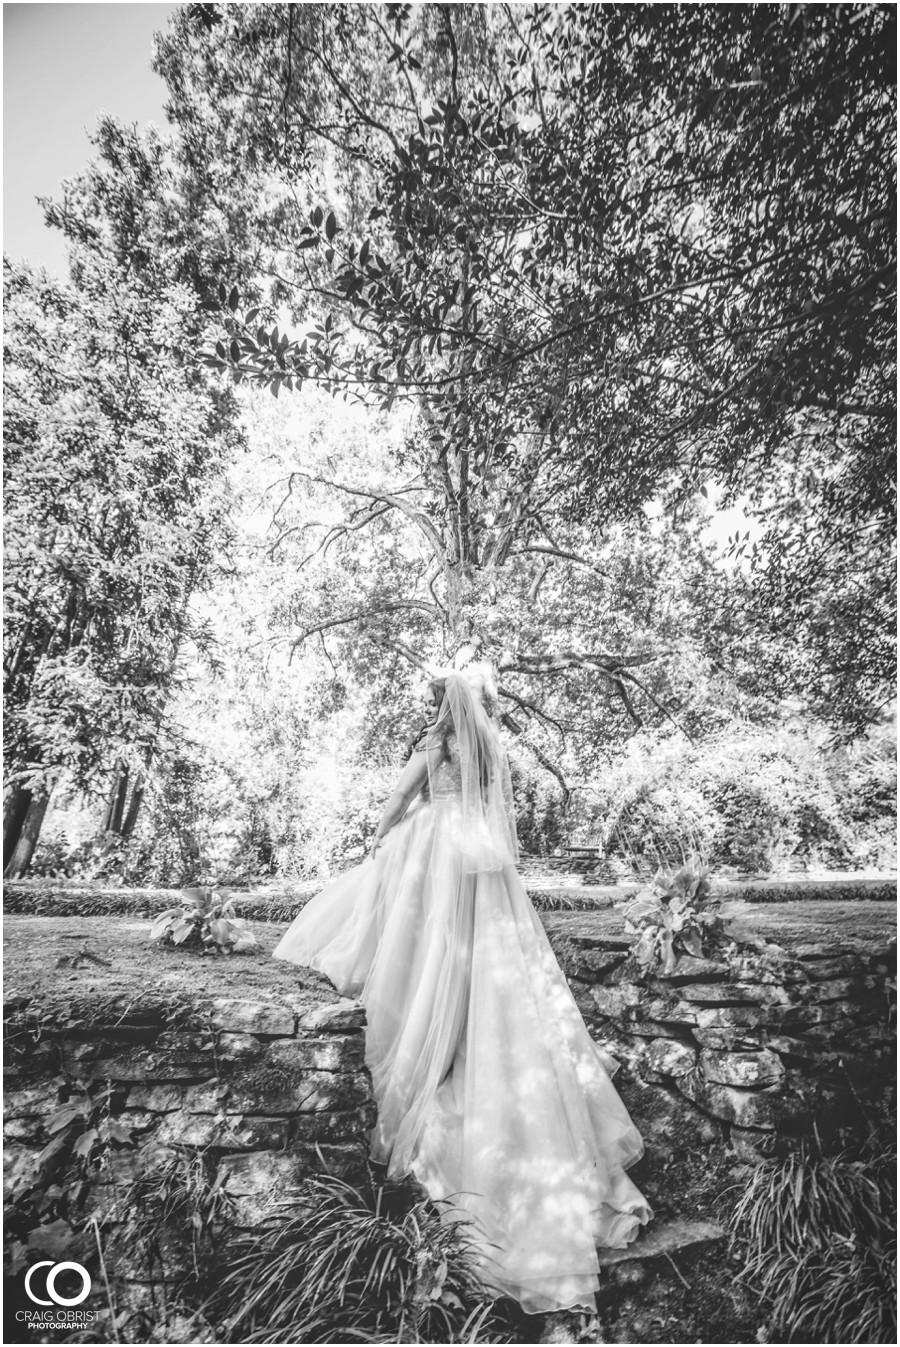 Dunaway gardens Wedding Fairytale Disney Portraits_0051.jpg